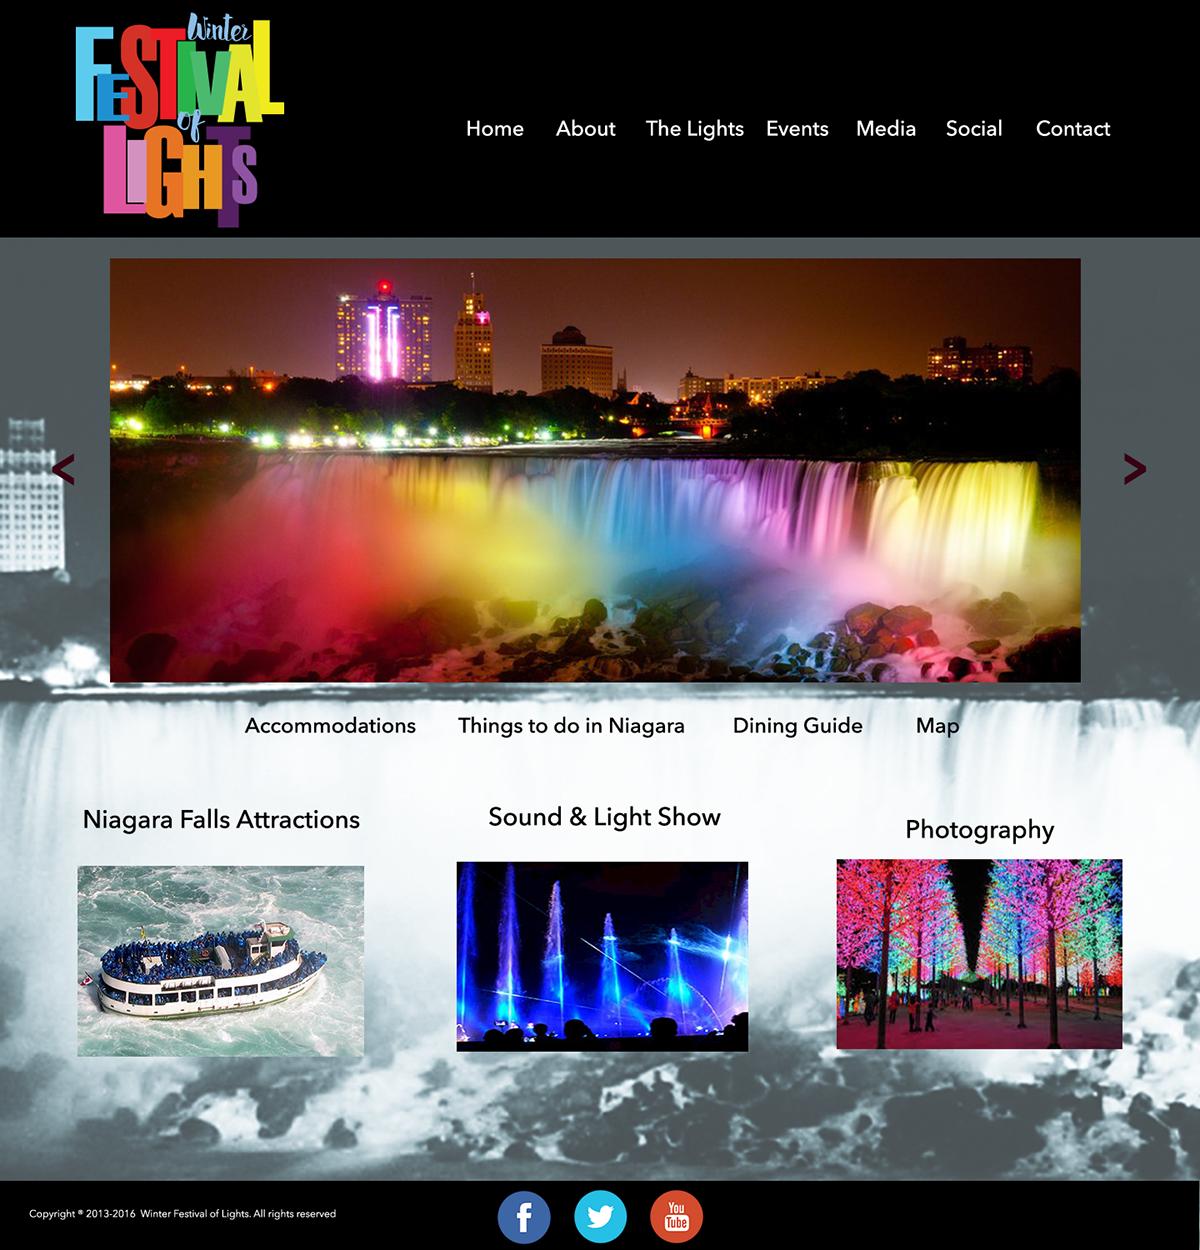 Winter Festival Of Lights Advertising Promotional On Wacom